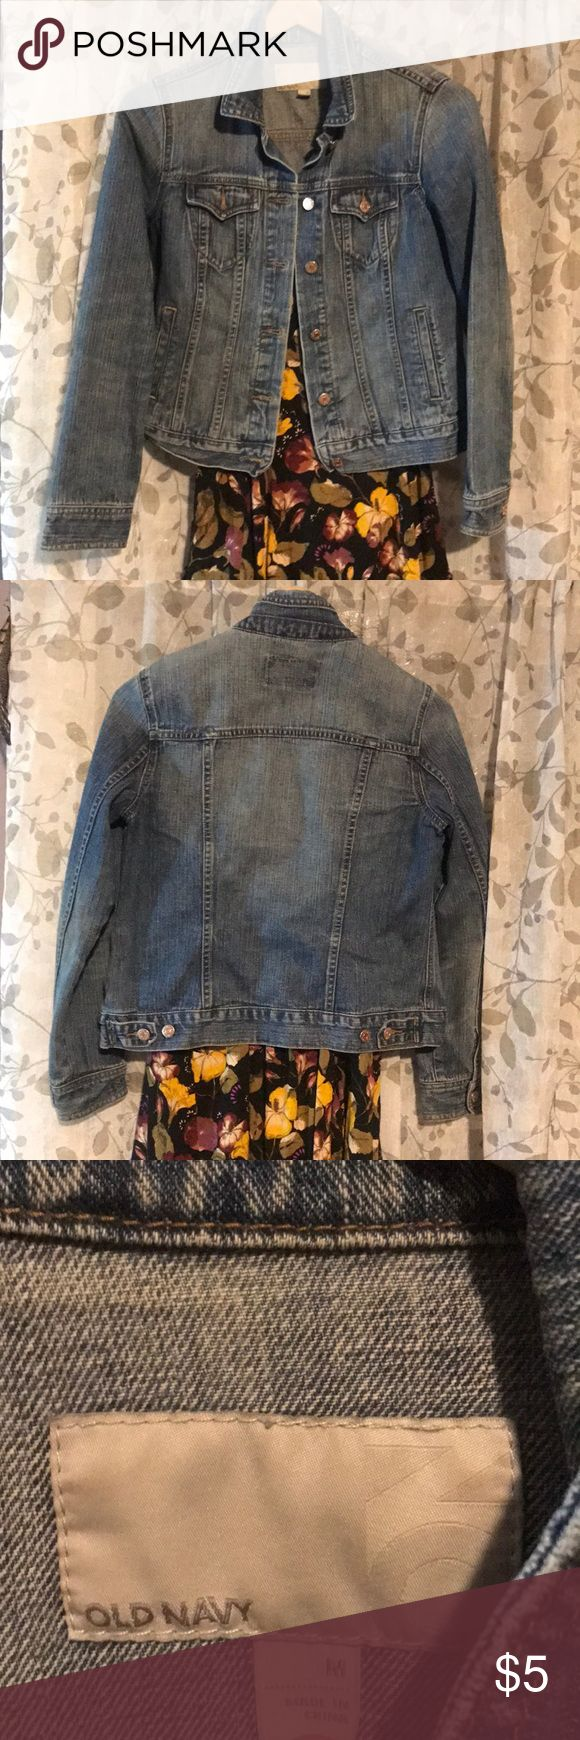 Old Navy Denim jacket Old navy Long sleeve/blue jean jacket with 2 front + side pockets. Stretchable denim. SIZE M Old Navy Jackets & Coats Jean Jackets